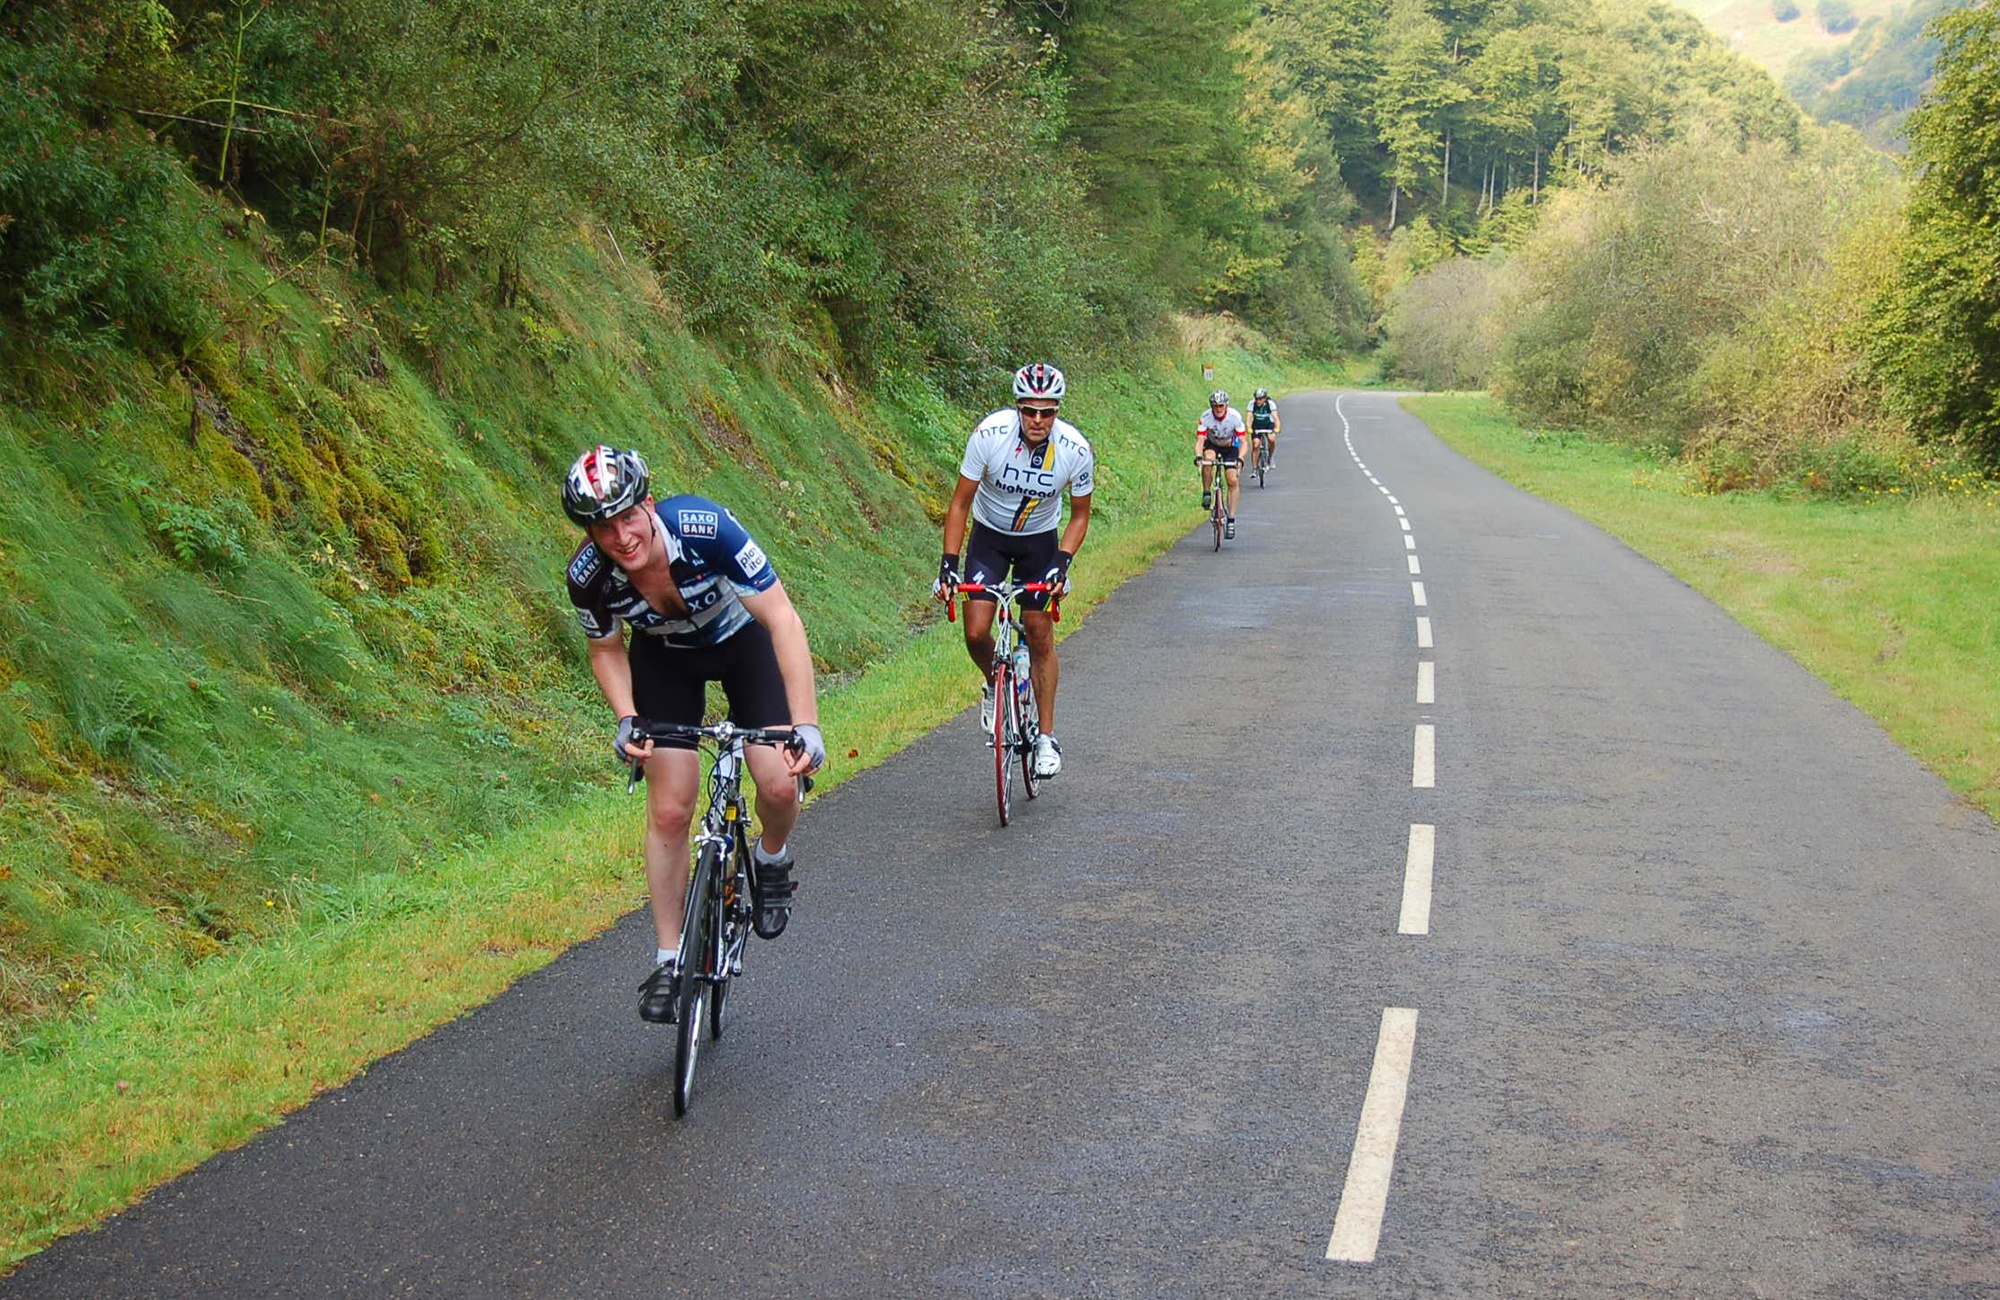 Cycling_uphill_Pyrenees.jpg